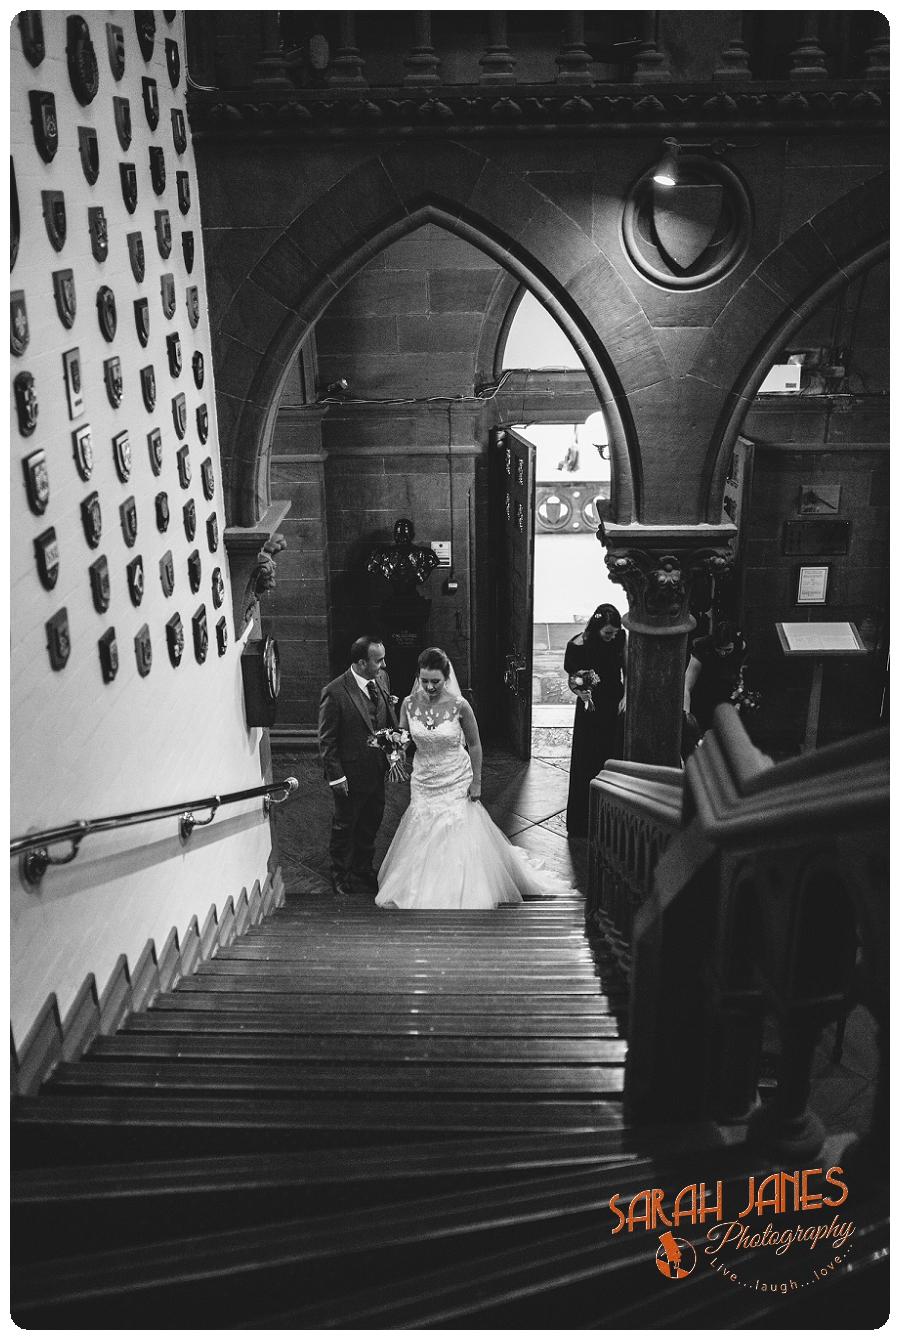 Wedding photography Chester, Weddings Rowton Hall, Wedding photography at Rowton Hall, Sarah Janes Photograpphy_0015.jpg